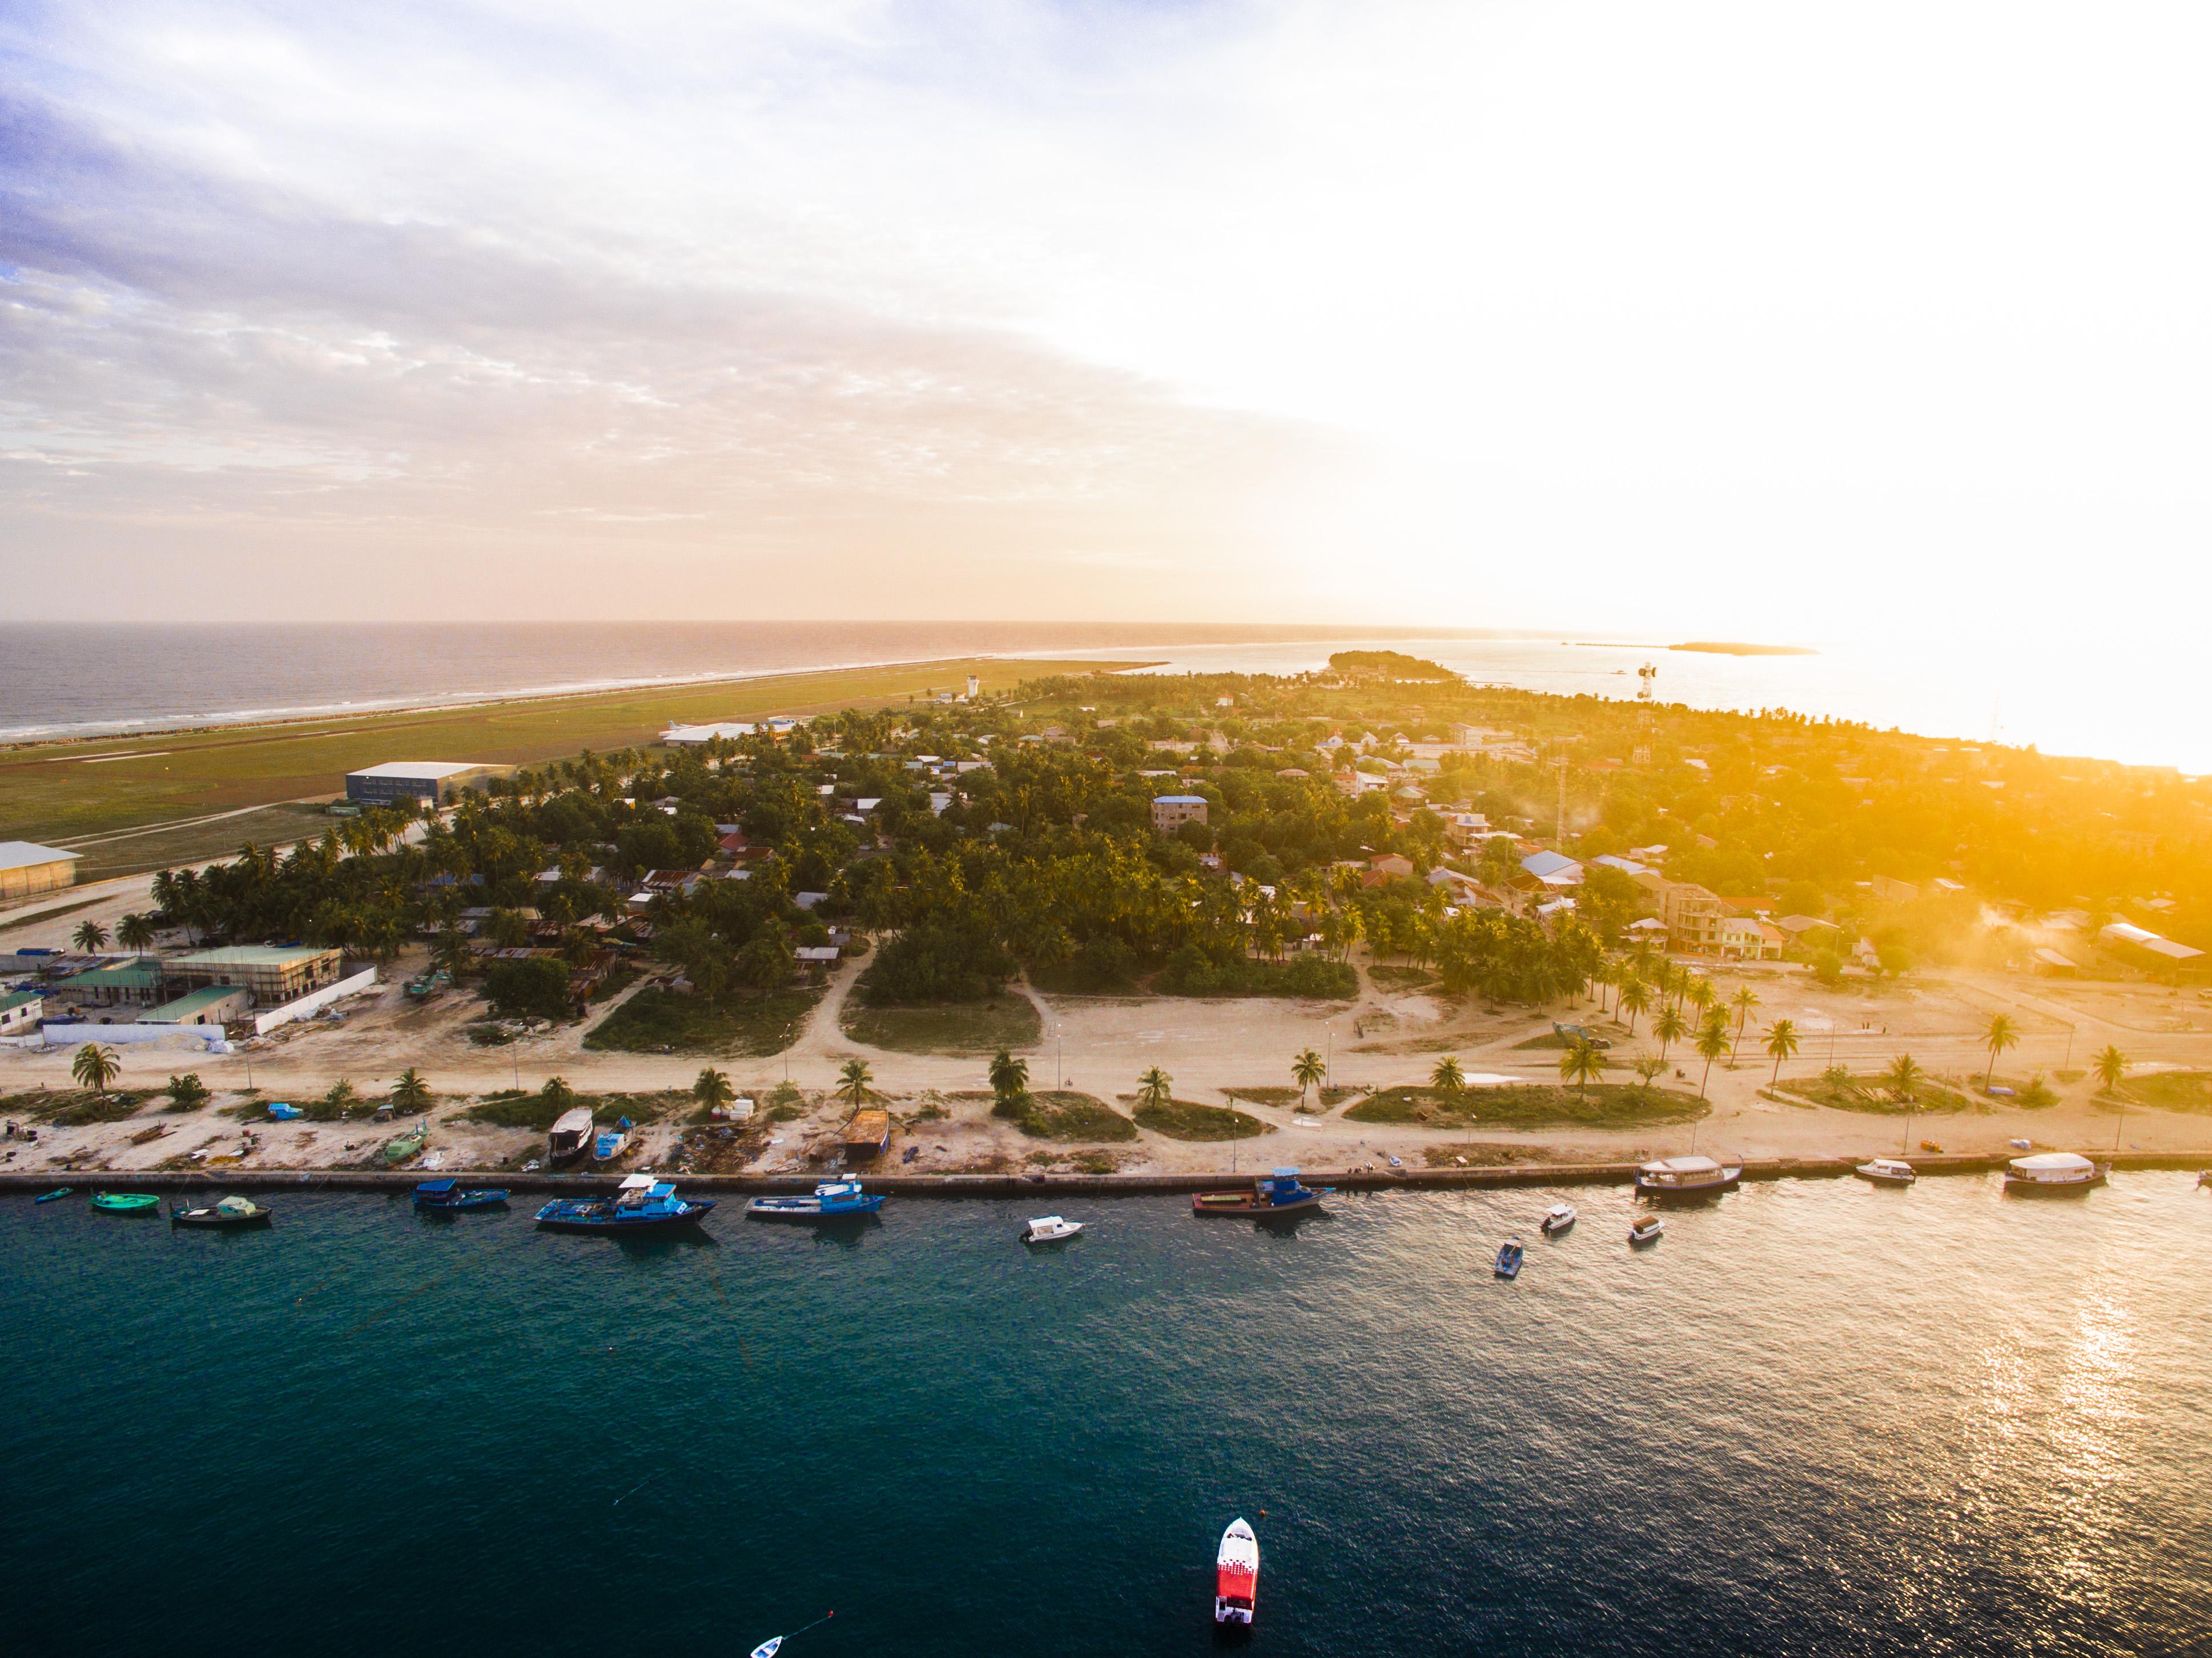 Lacabana Maldives  A Dh Maamigili Island (4)